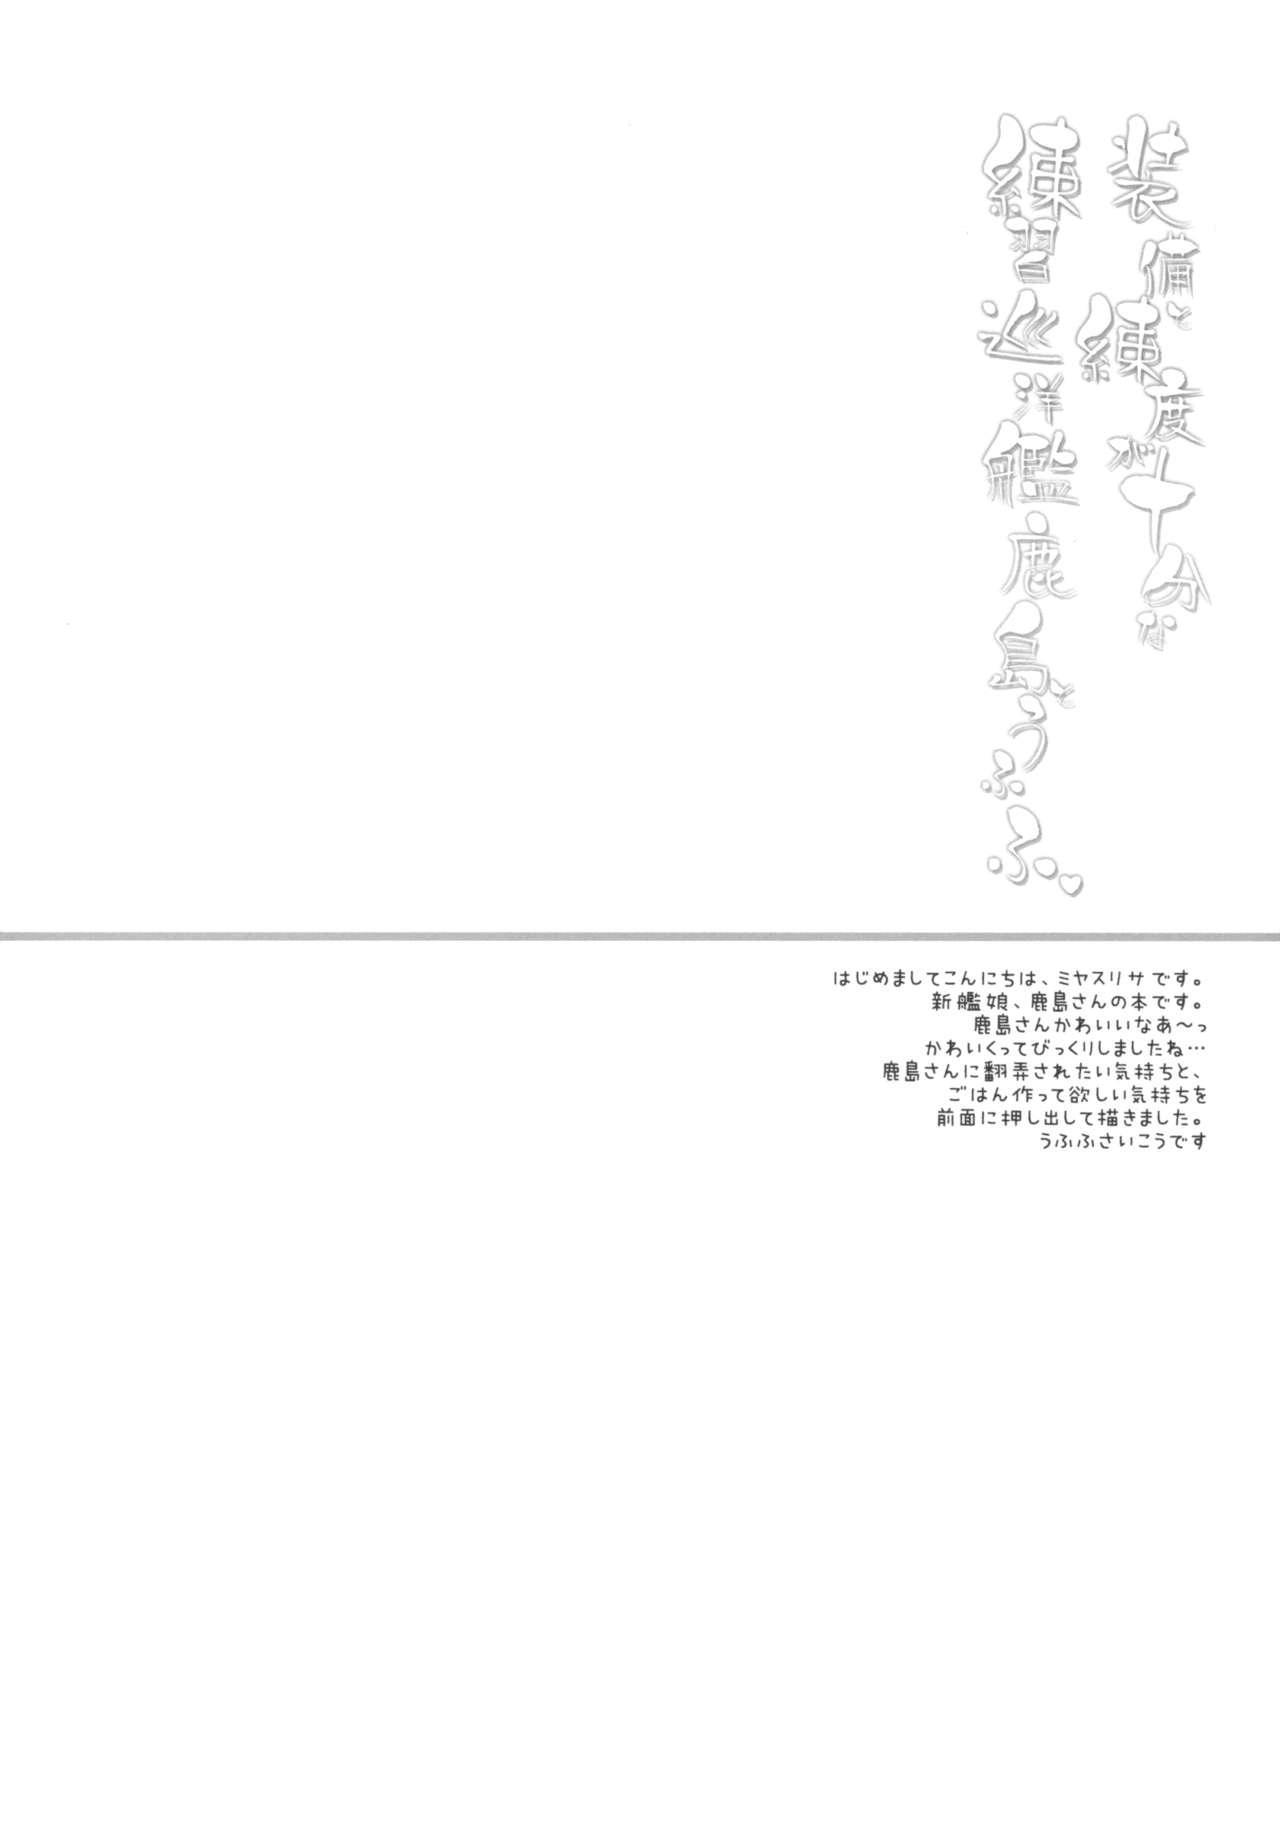 Soubi to Rendo ga Juubun na Renshuu Junyoukan Kashima to Ufufu 2